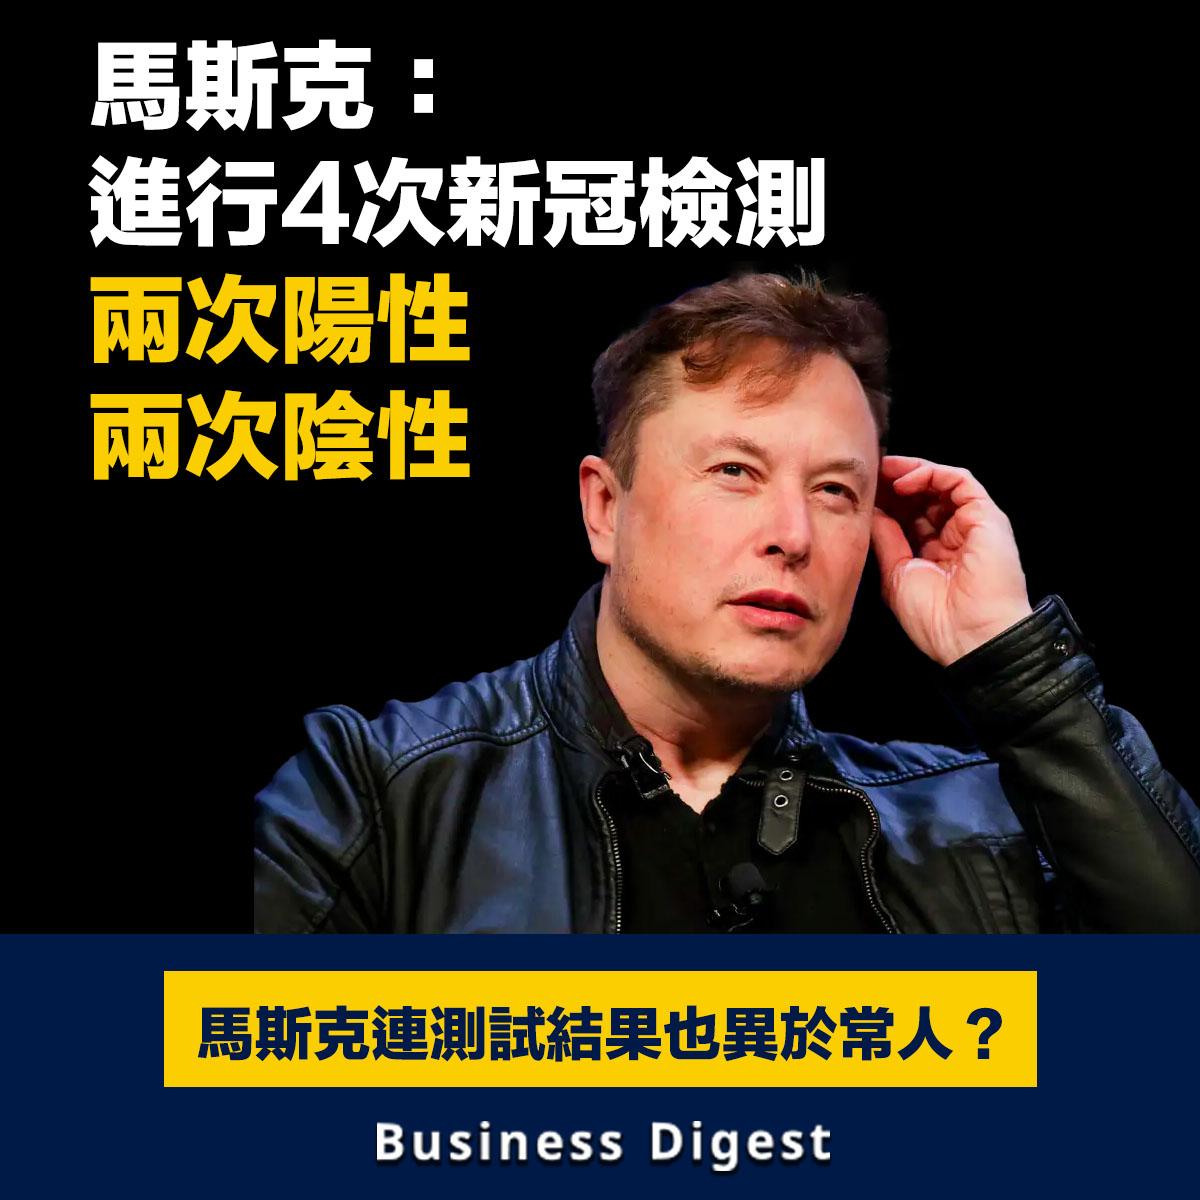 Tesla CEO馬斯克在Twitter上發帖自爆,指自己進行了4次新冠病毒檢測,其中兩次呈陽性,兩次呈陰性。